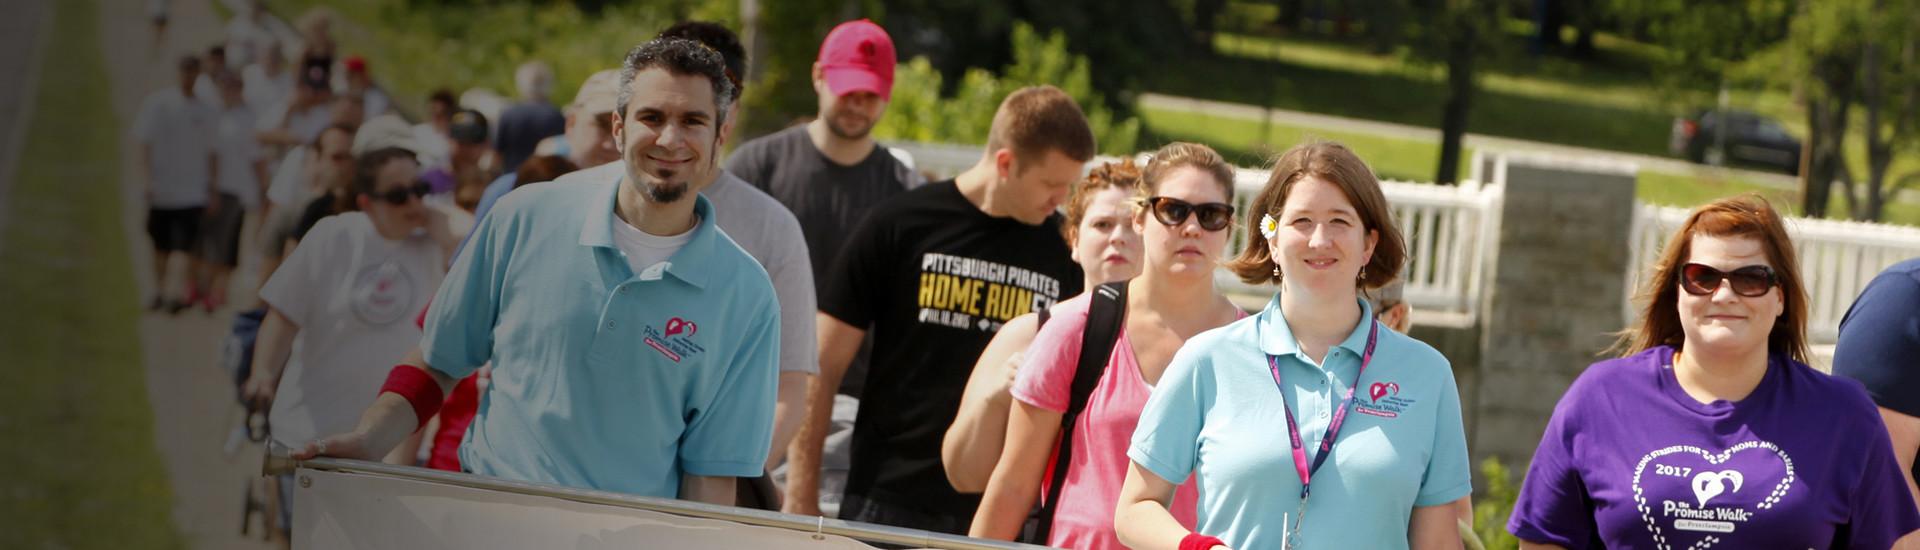 Pittsburgh Promise Walk for Preeclampsia